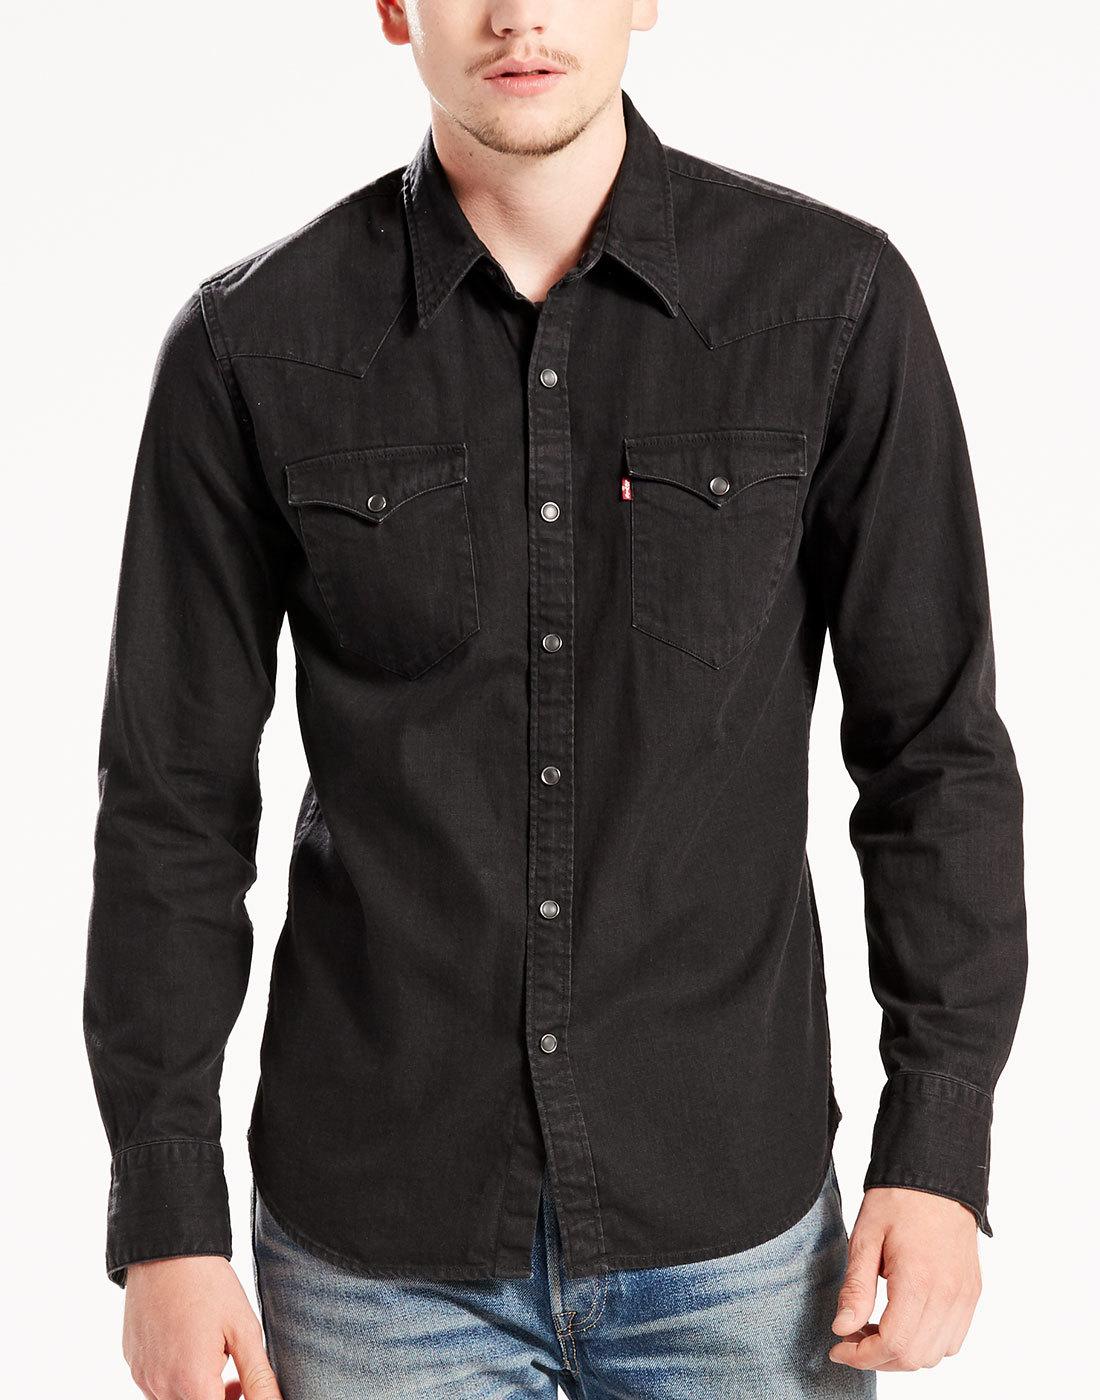 levi 39 s barstow men 39 s retro 70s mod denim western shirt in